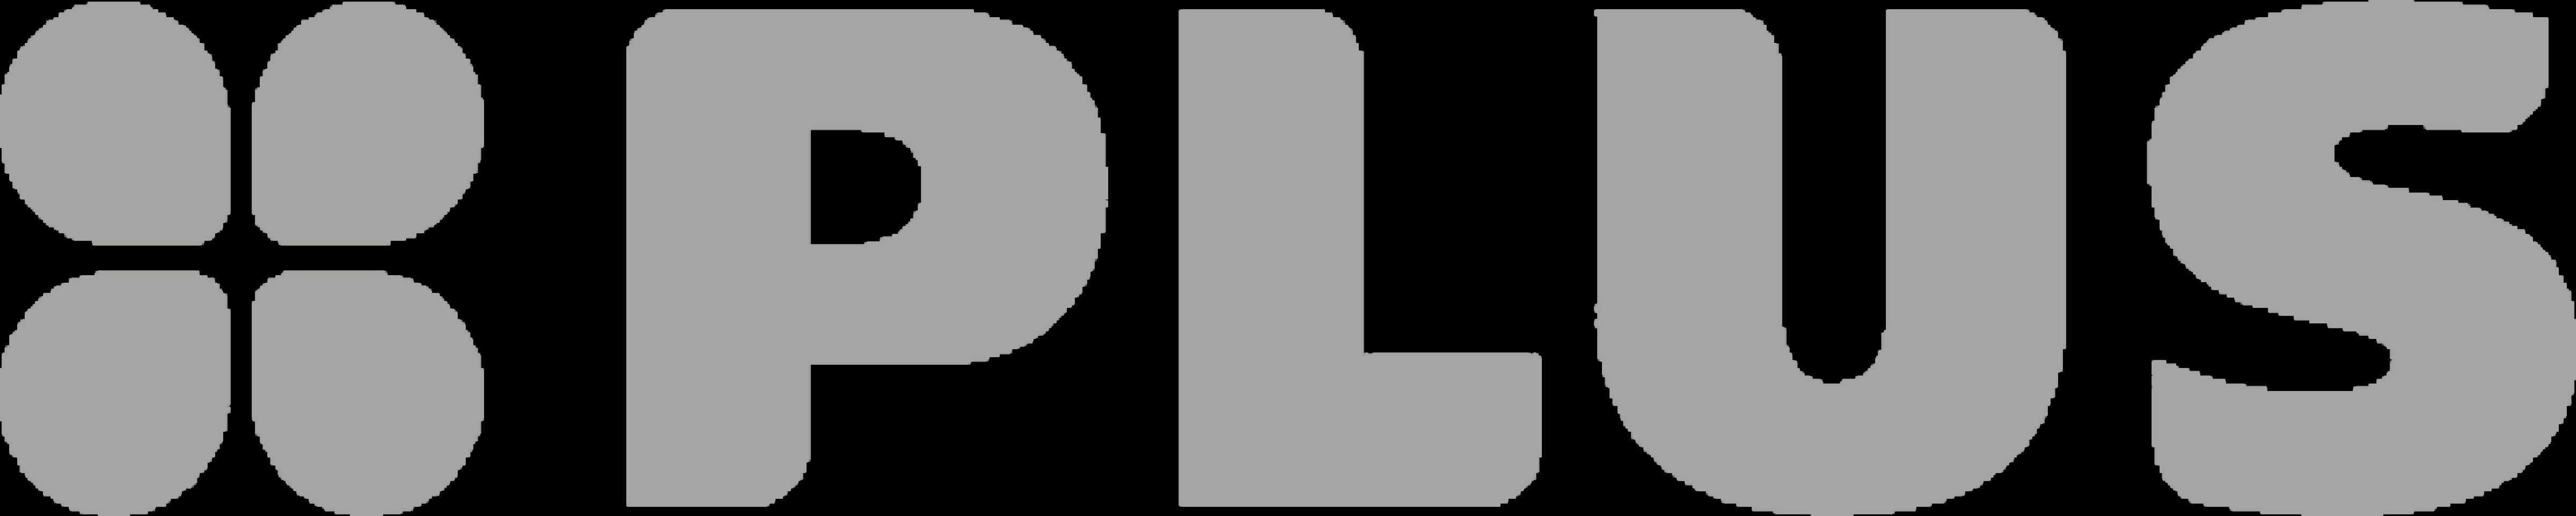 grey-plus-logo-v2.png